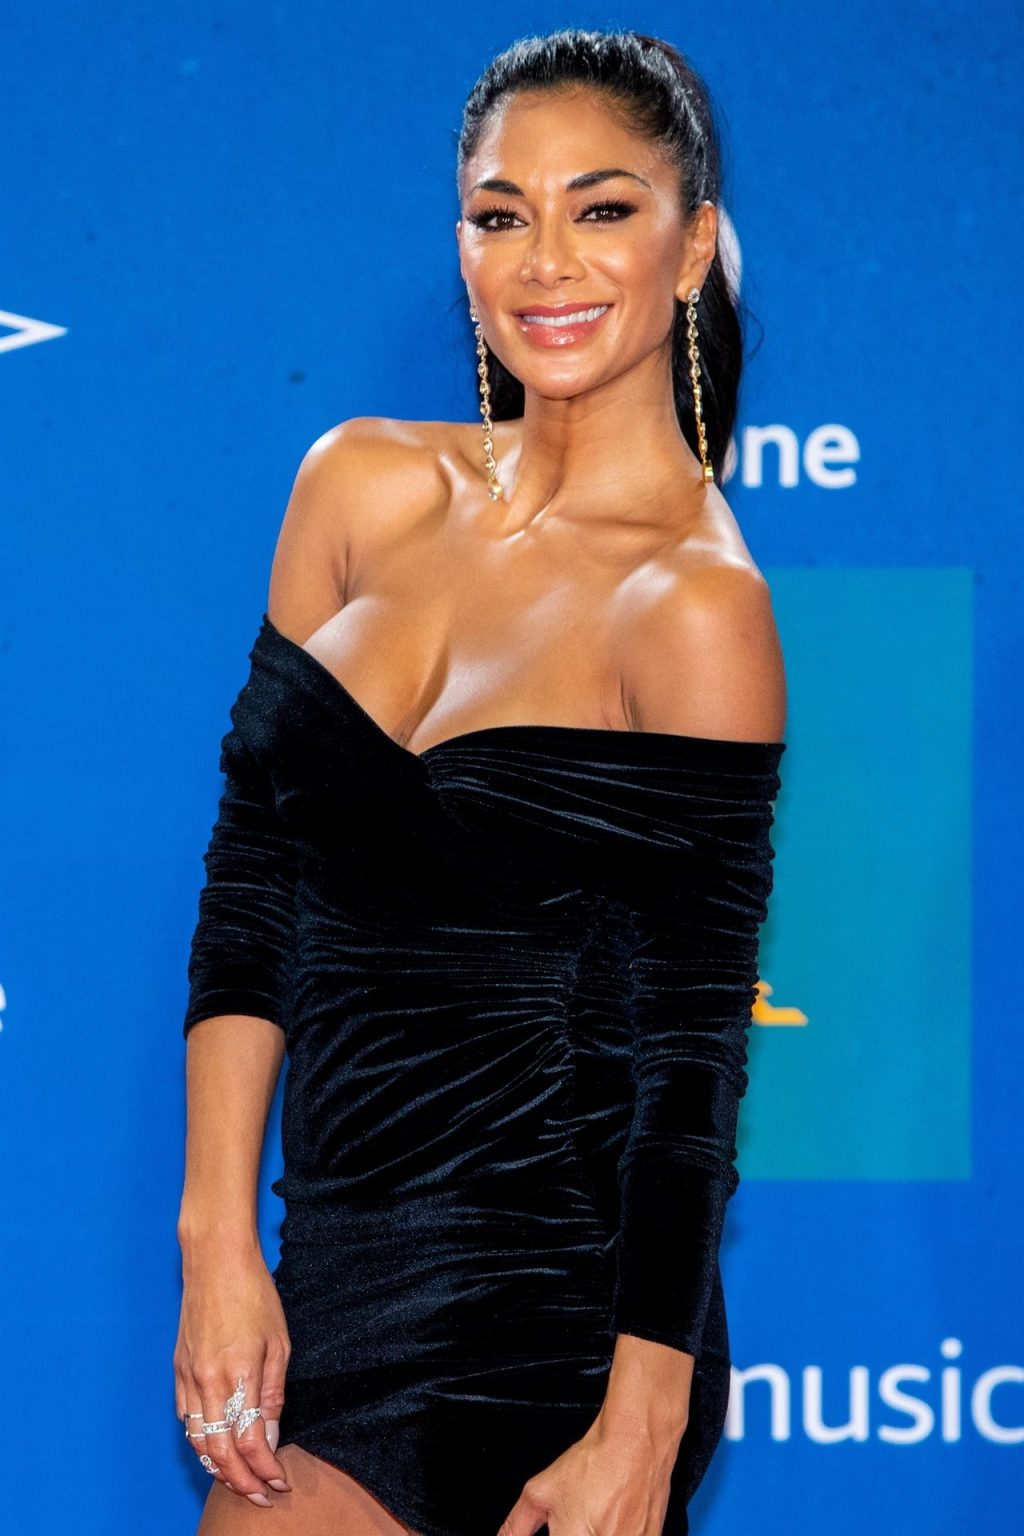 Nicole Scherzinger Sexy (17 New Photos)